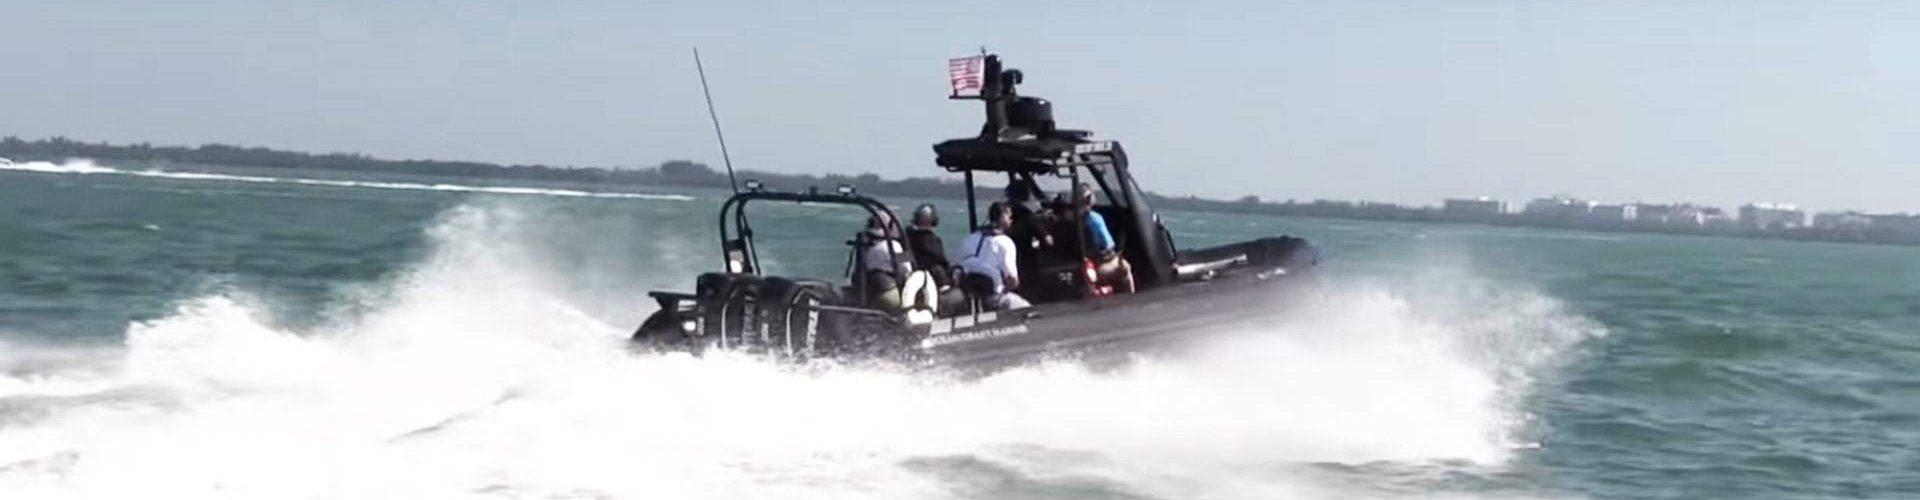 Ocean-Craft-9.5-Meter-High-Speed-Vessel-Interdiction-RHIB-review-by-BoatTest